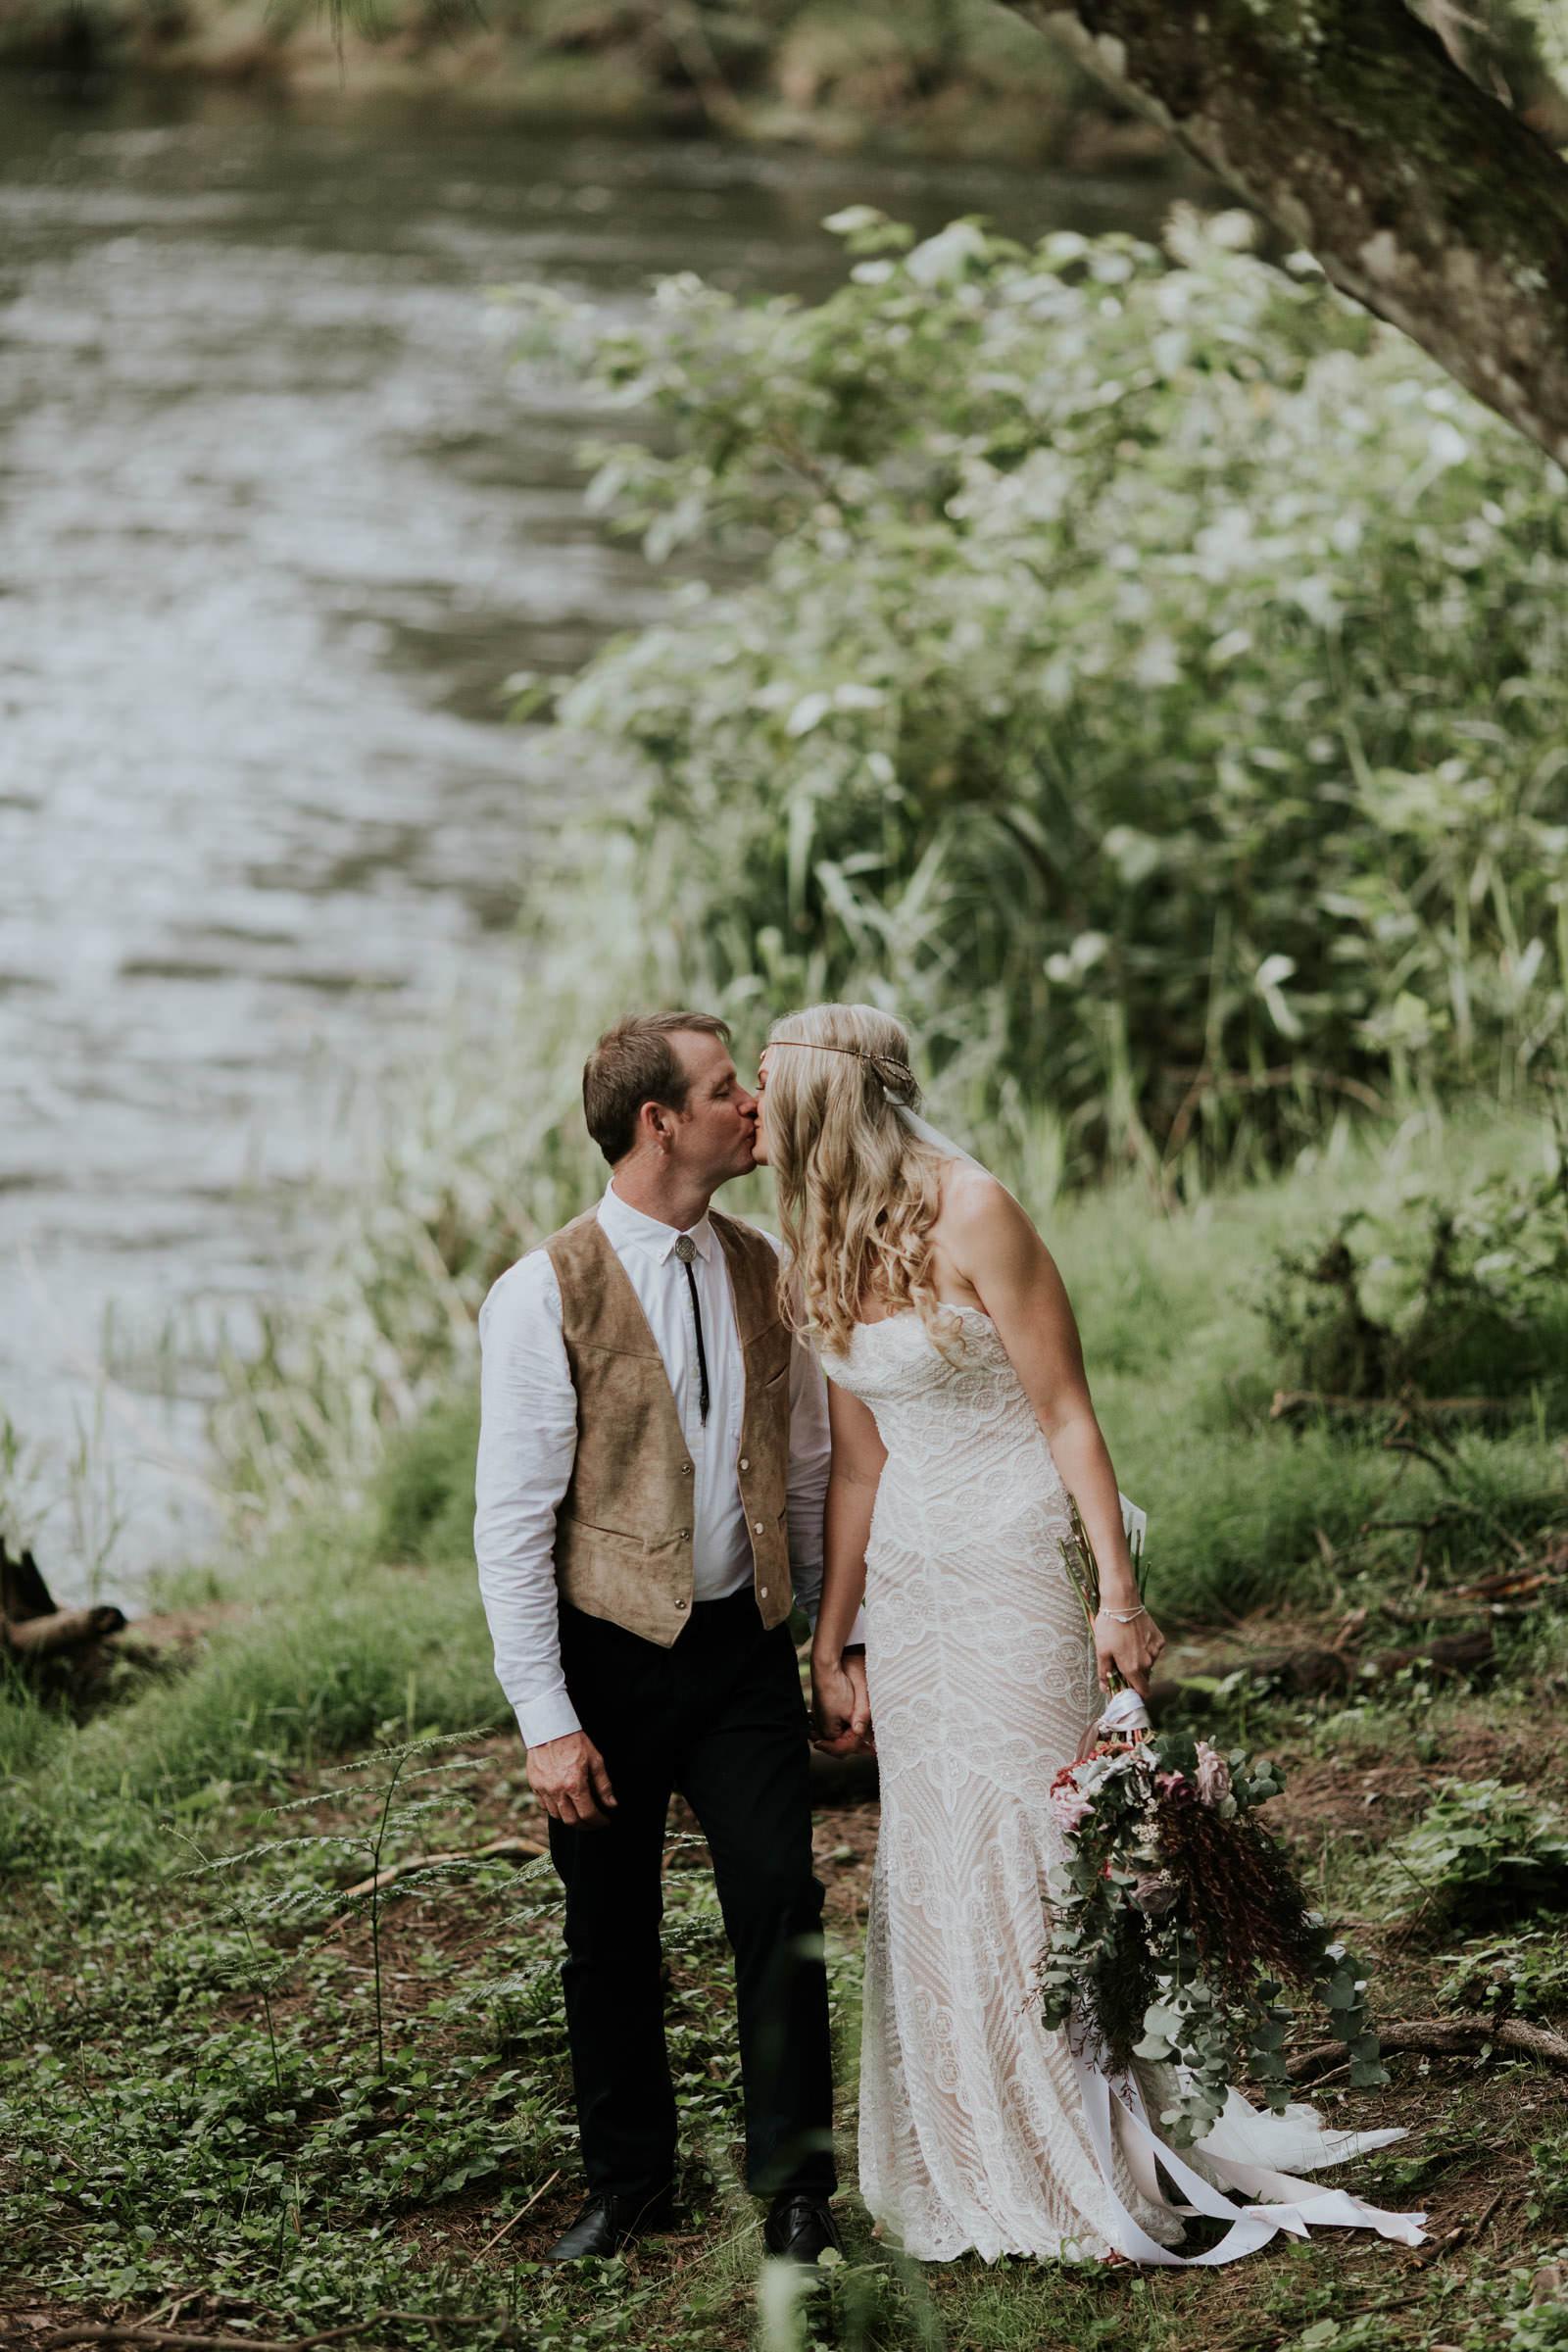 Emma+John+Far+South+Coast+Wedding+Festivl+Glamping+Bush-122.jpg